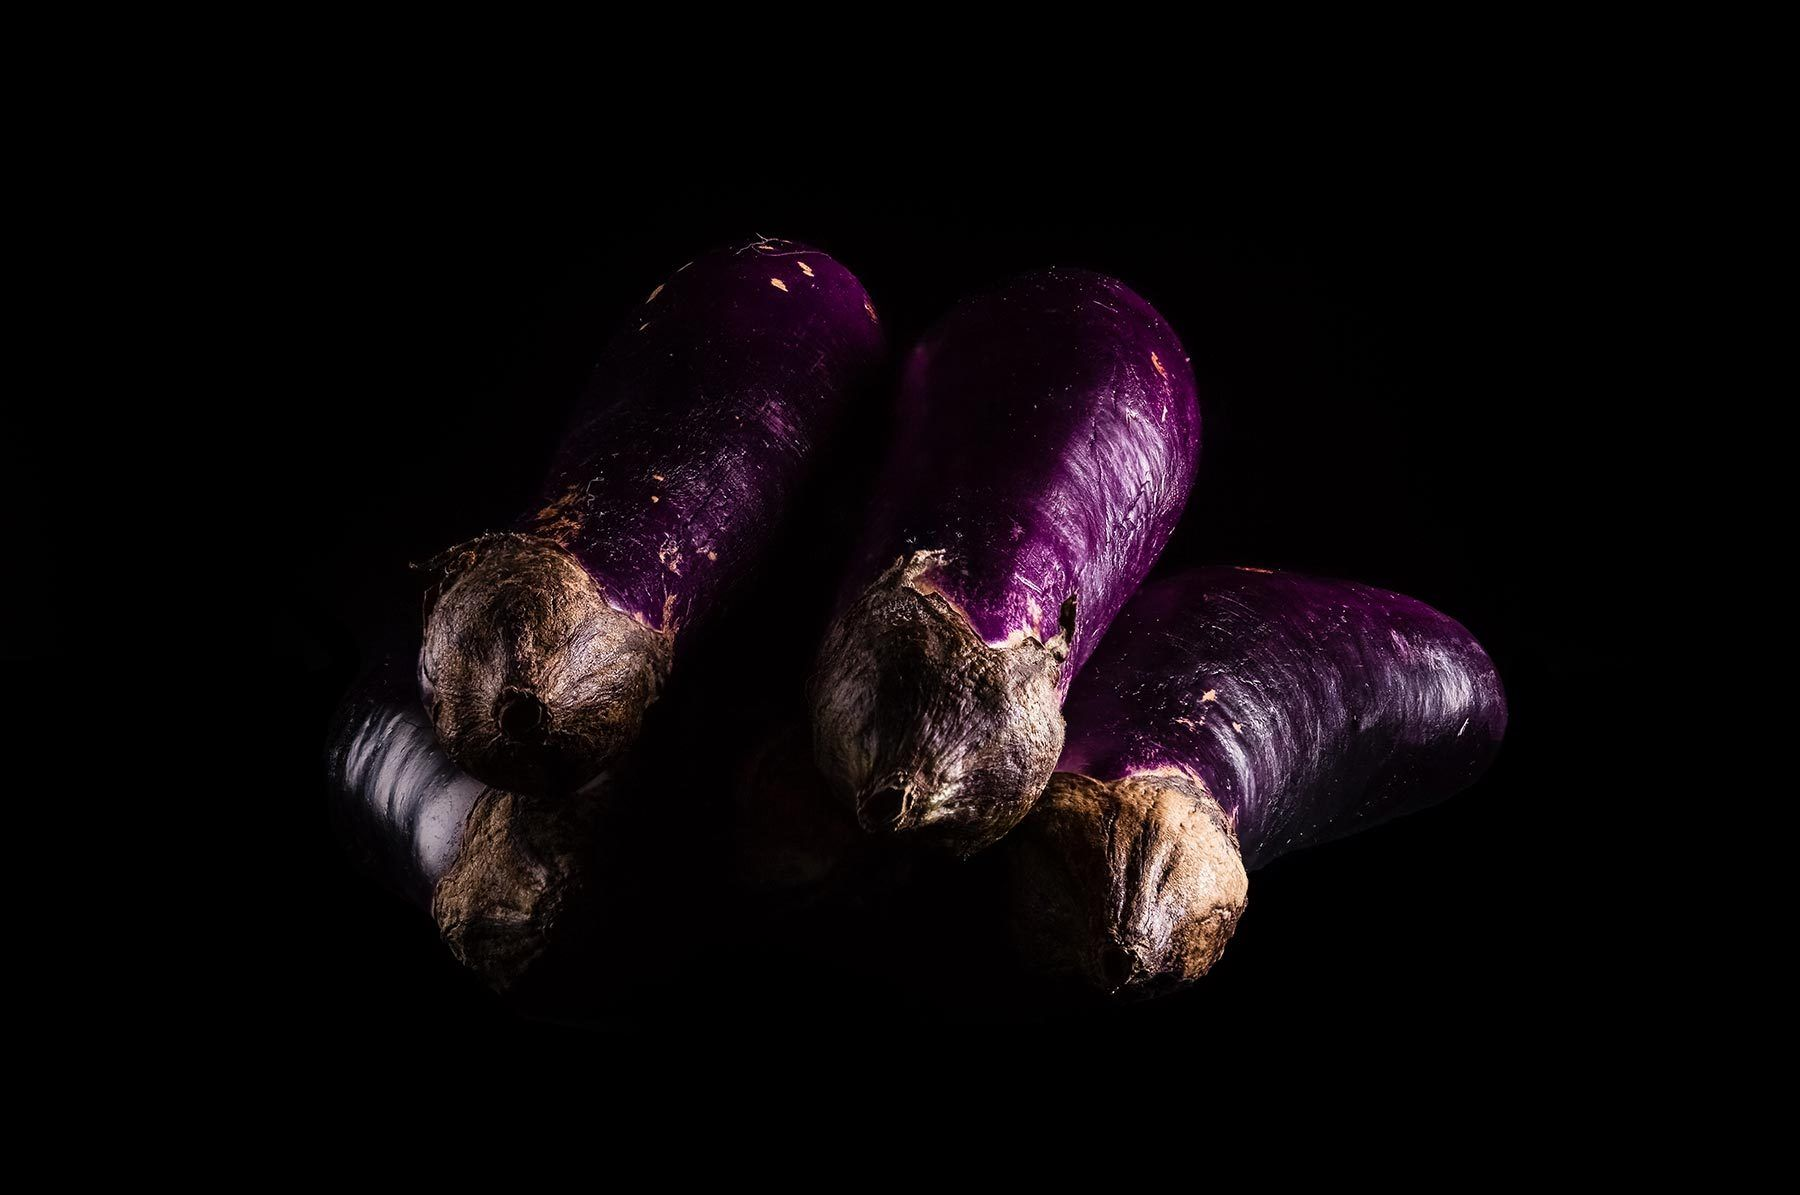 1asian_eggplant_1.jpg